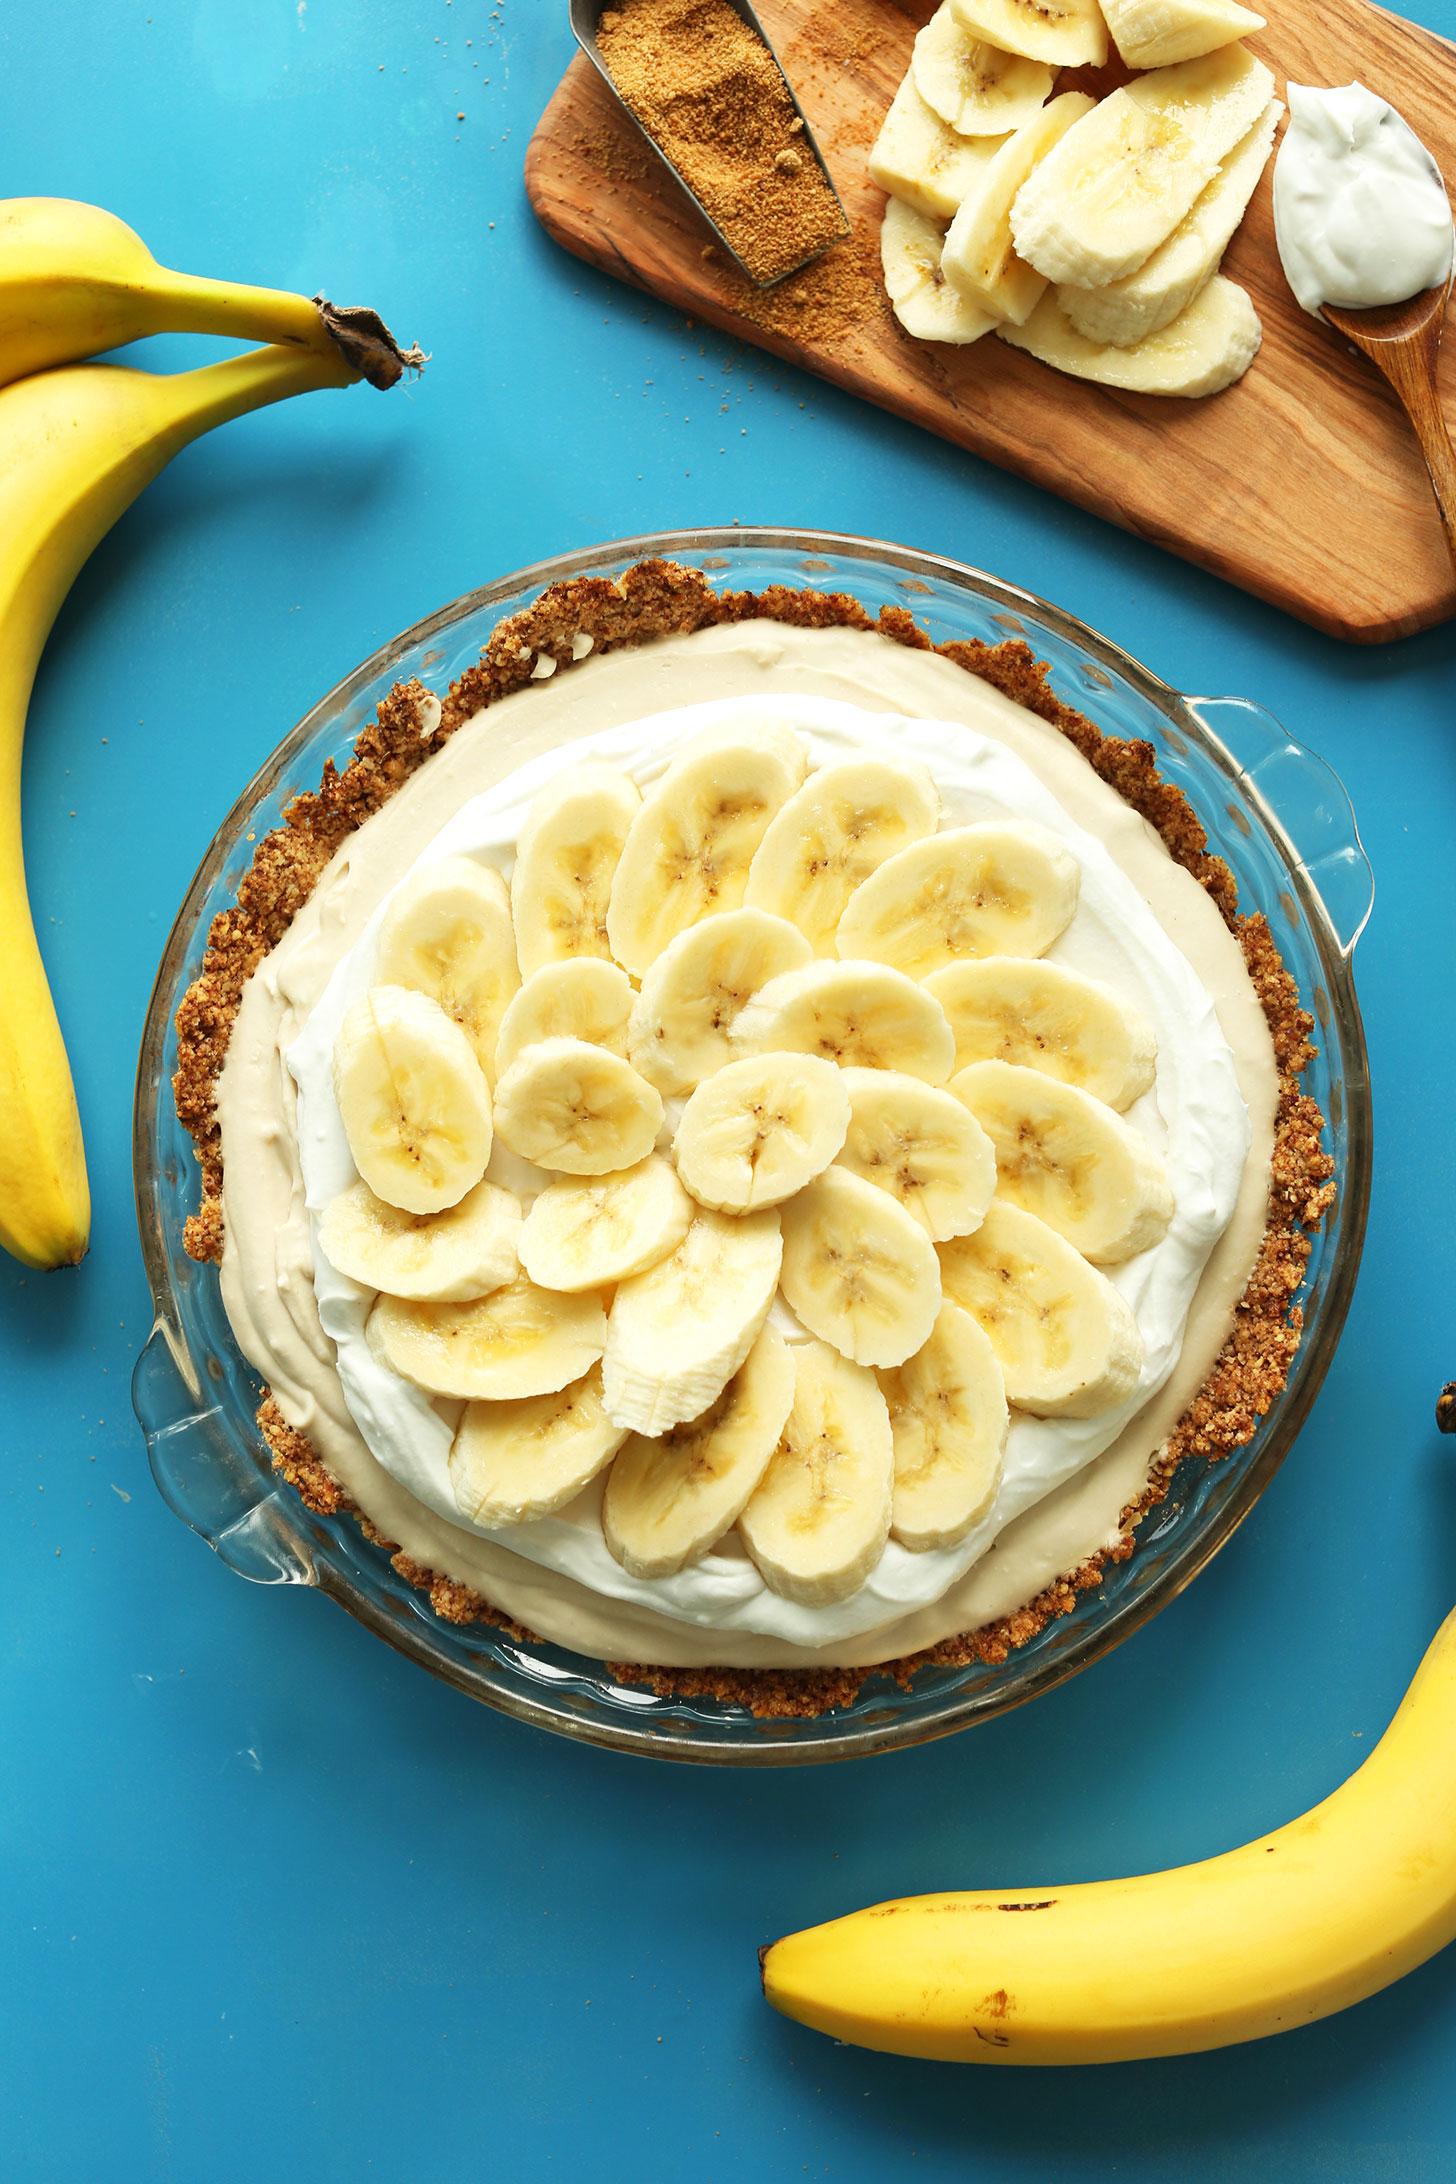 Top down shot of our beautiful gluten-free vegan Banana Cream Pie